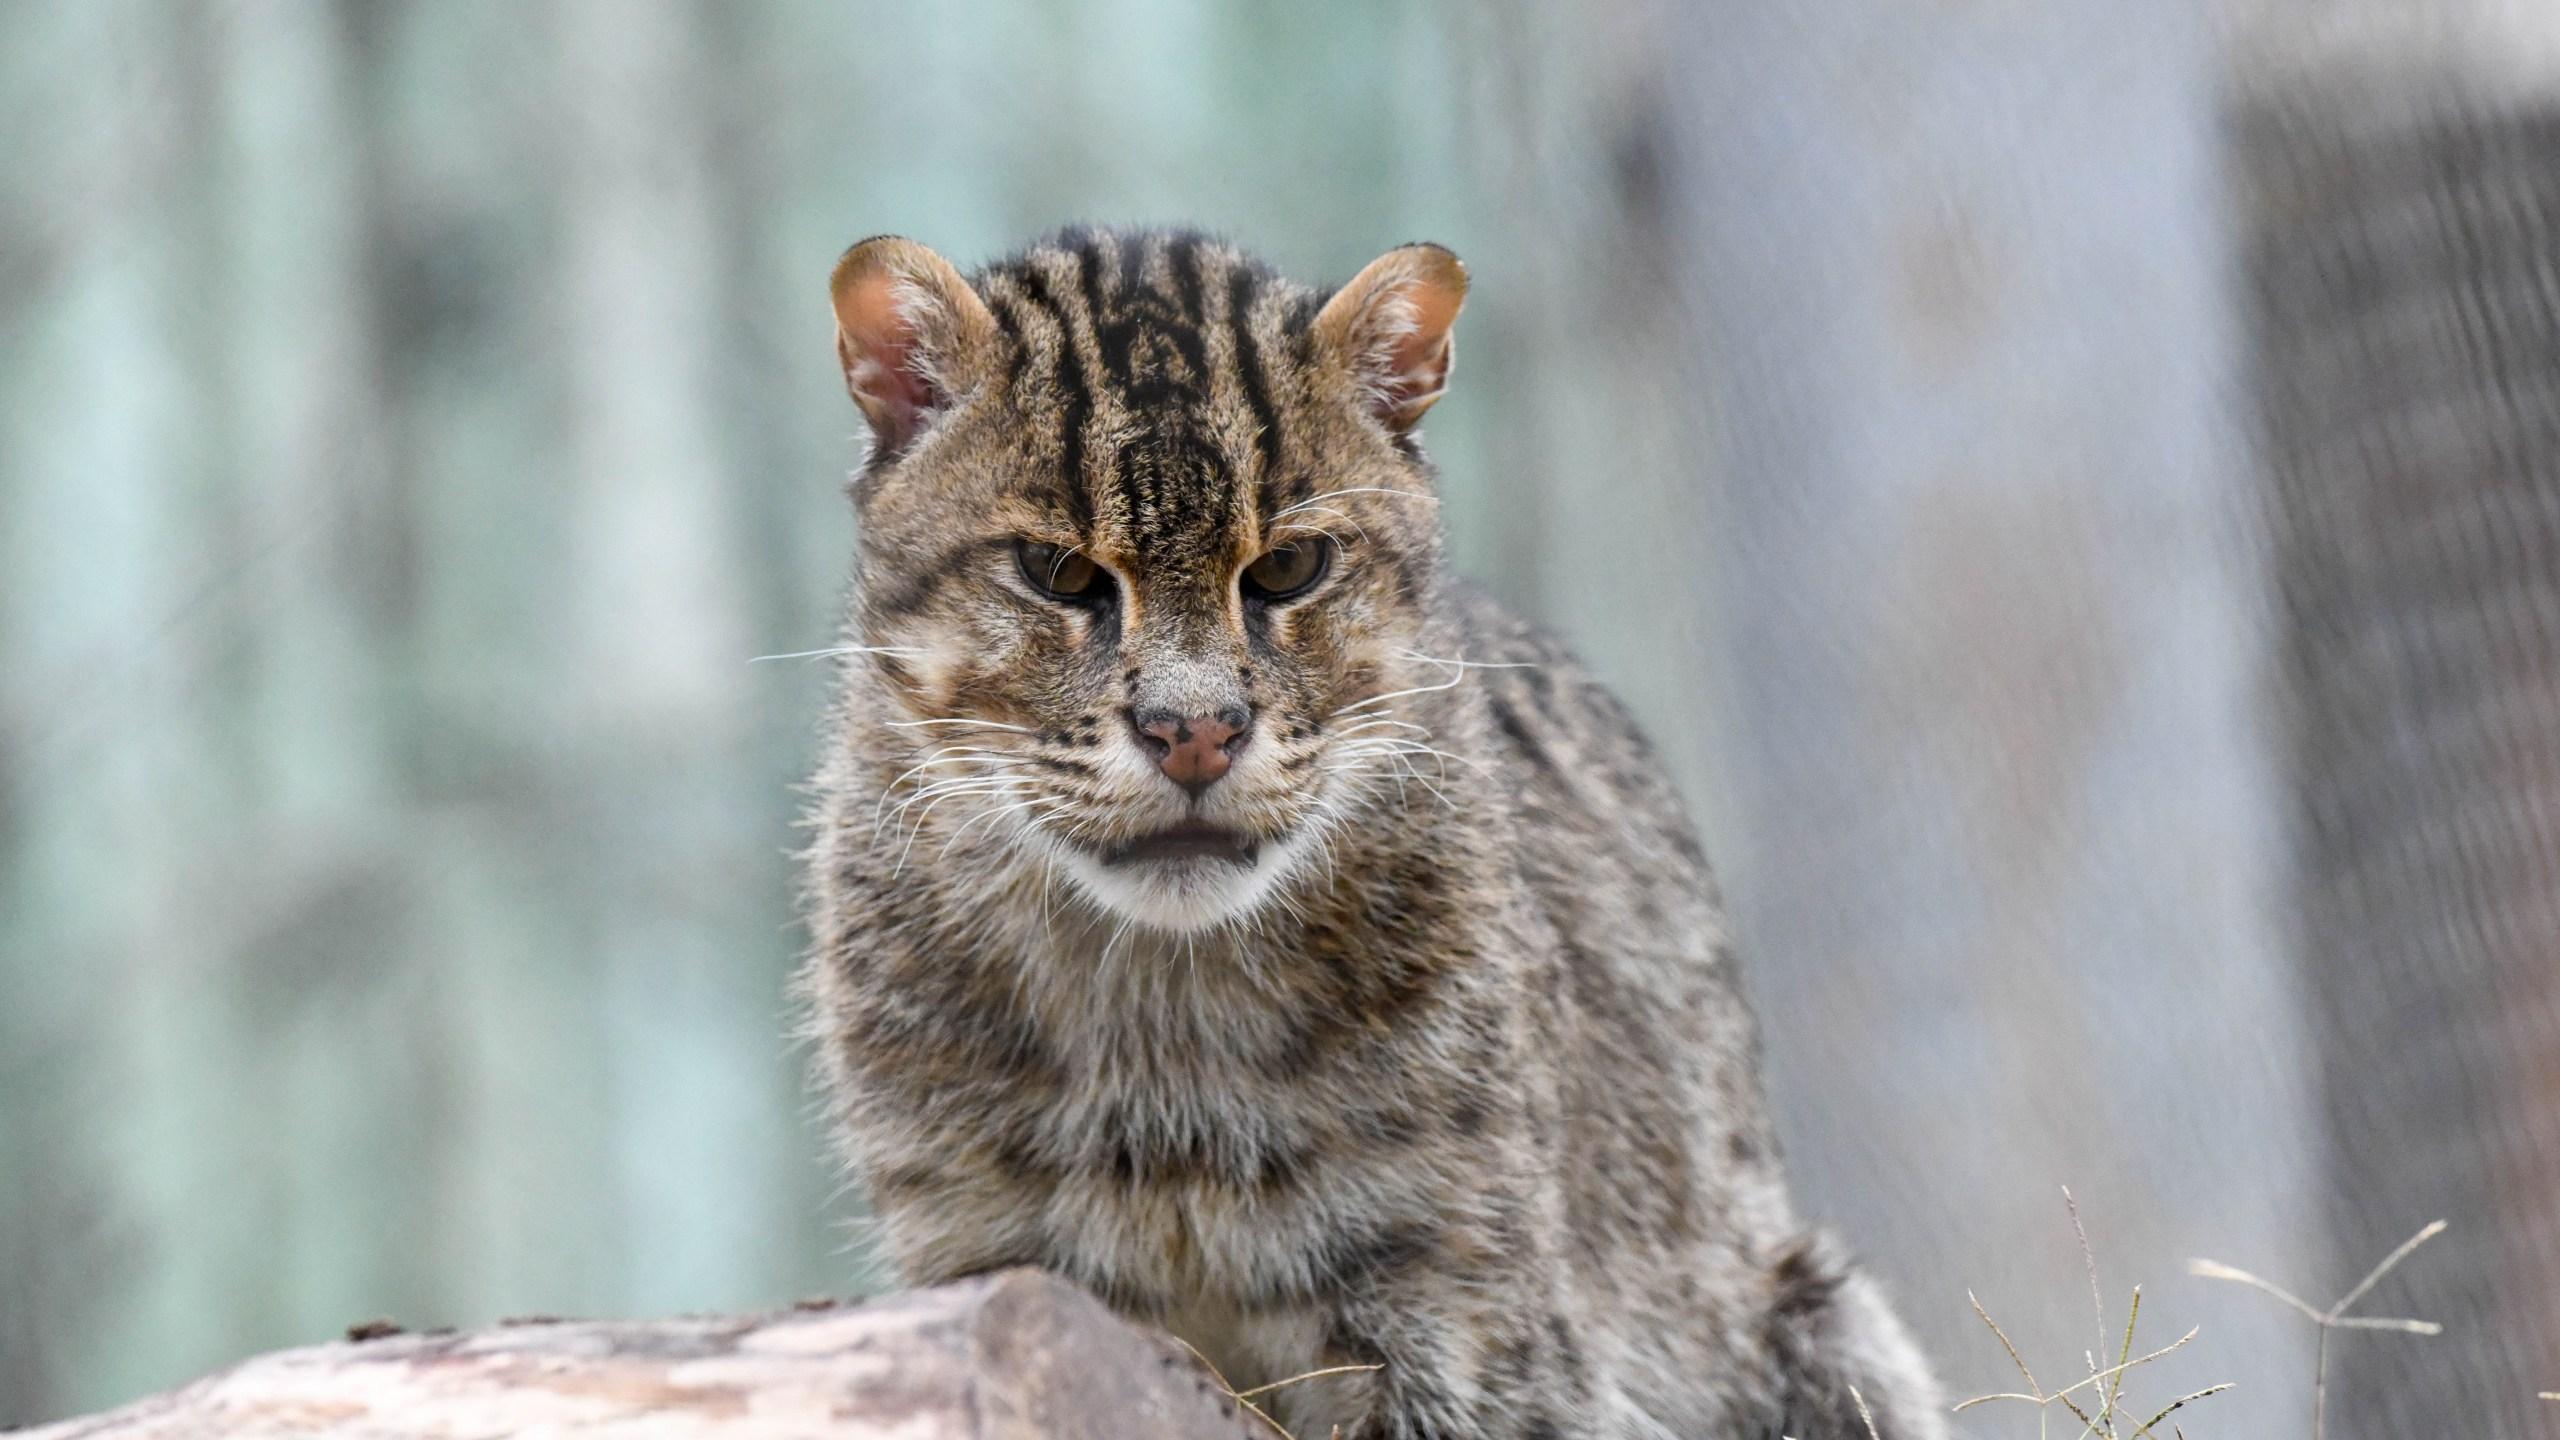 OKC Zoo new fishing cat Chet credit Sabrina Heise